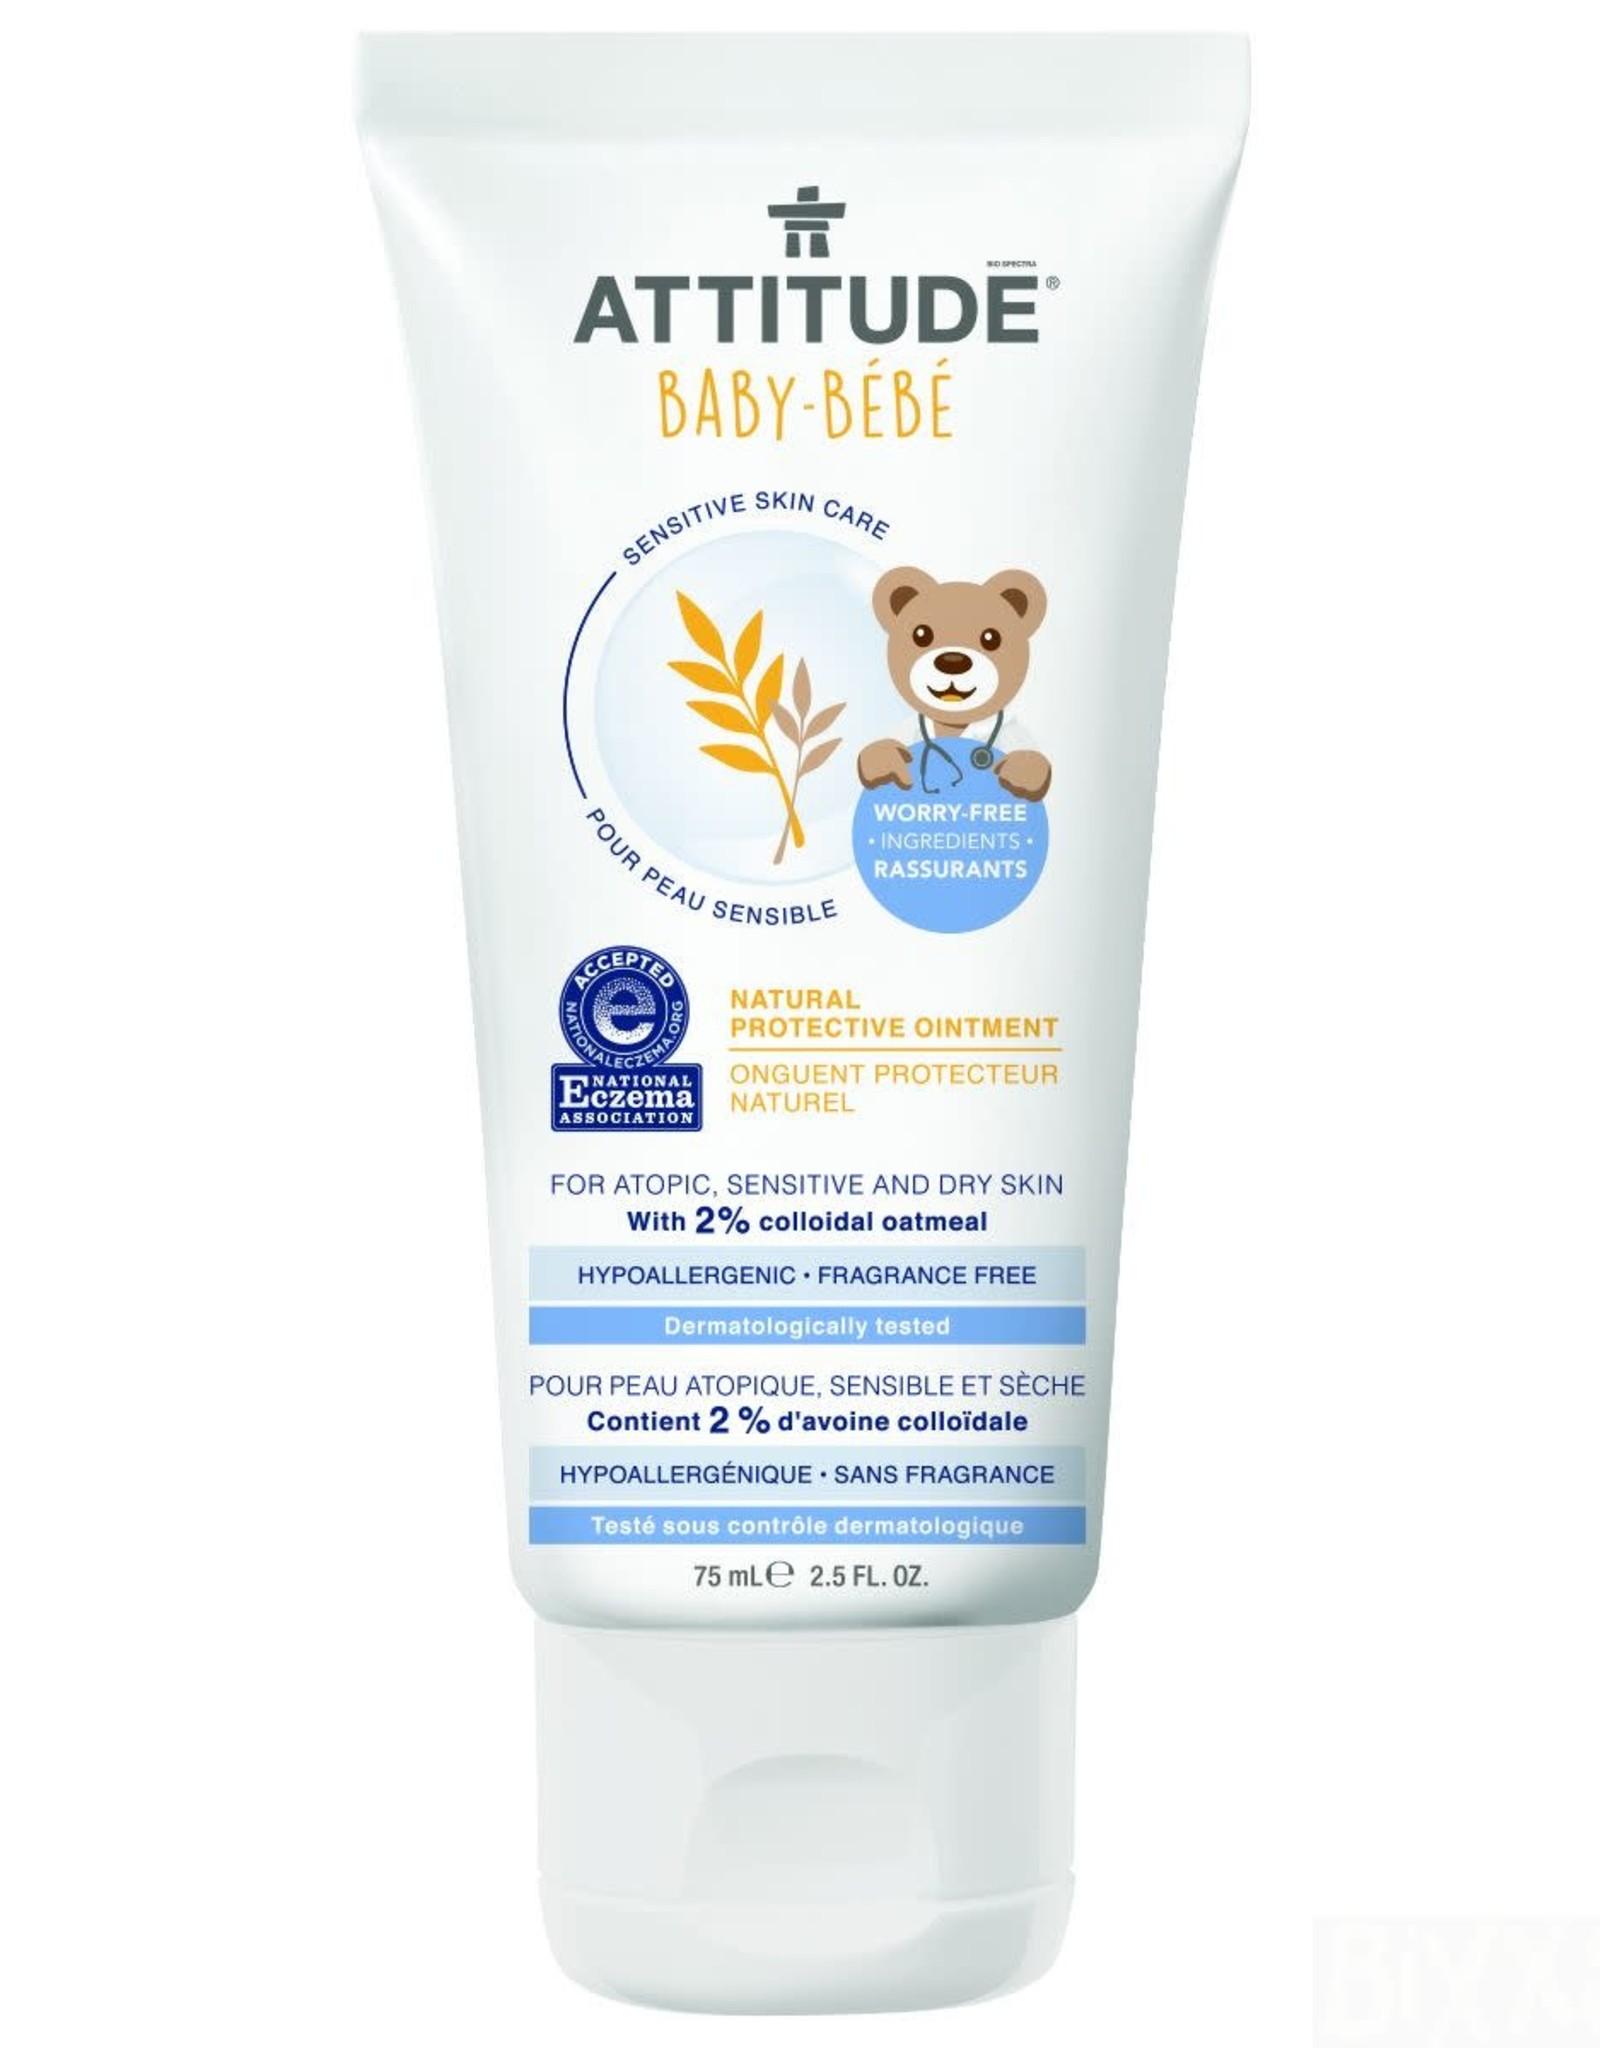 Attitude Attitude Sensitive Baby Natural Protective Ointment 75 ml